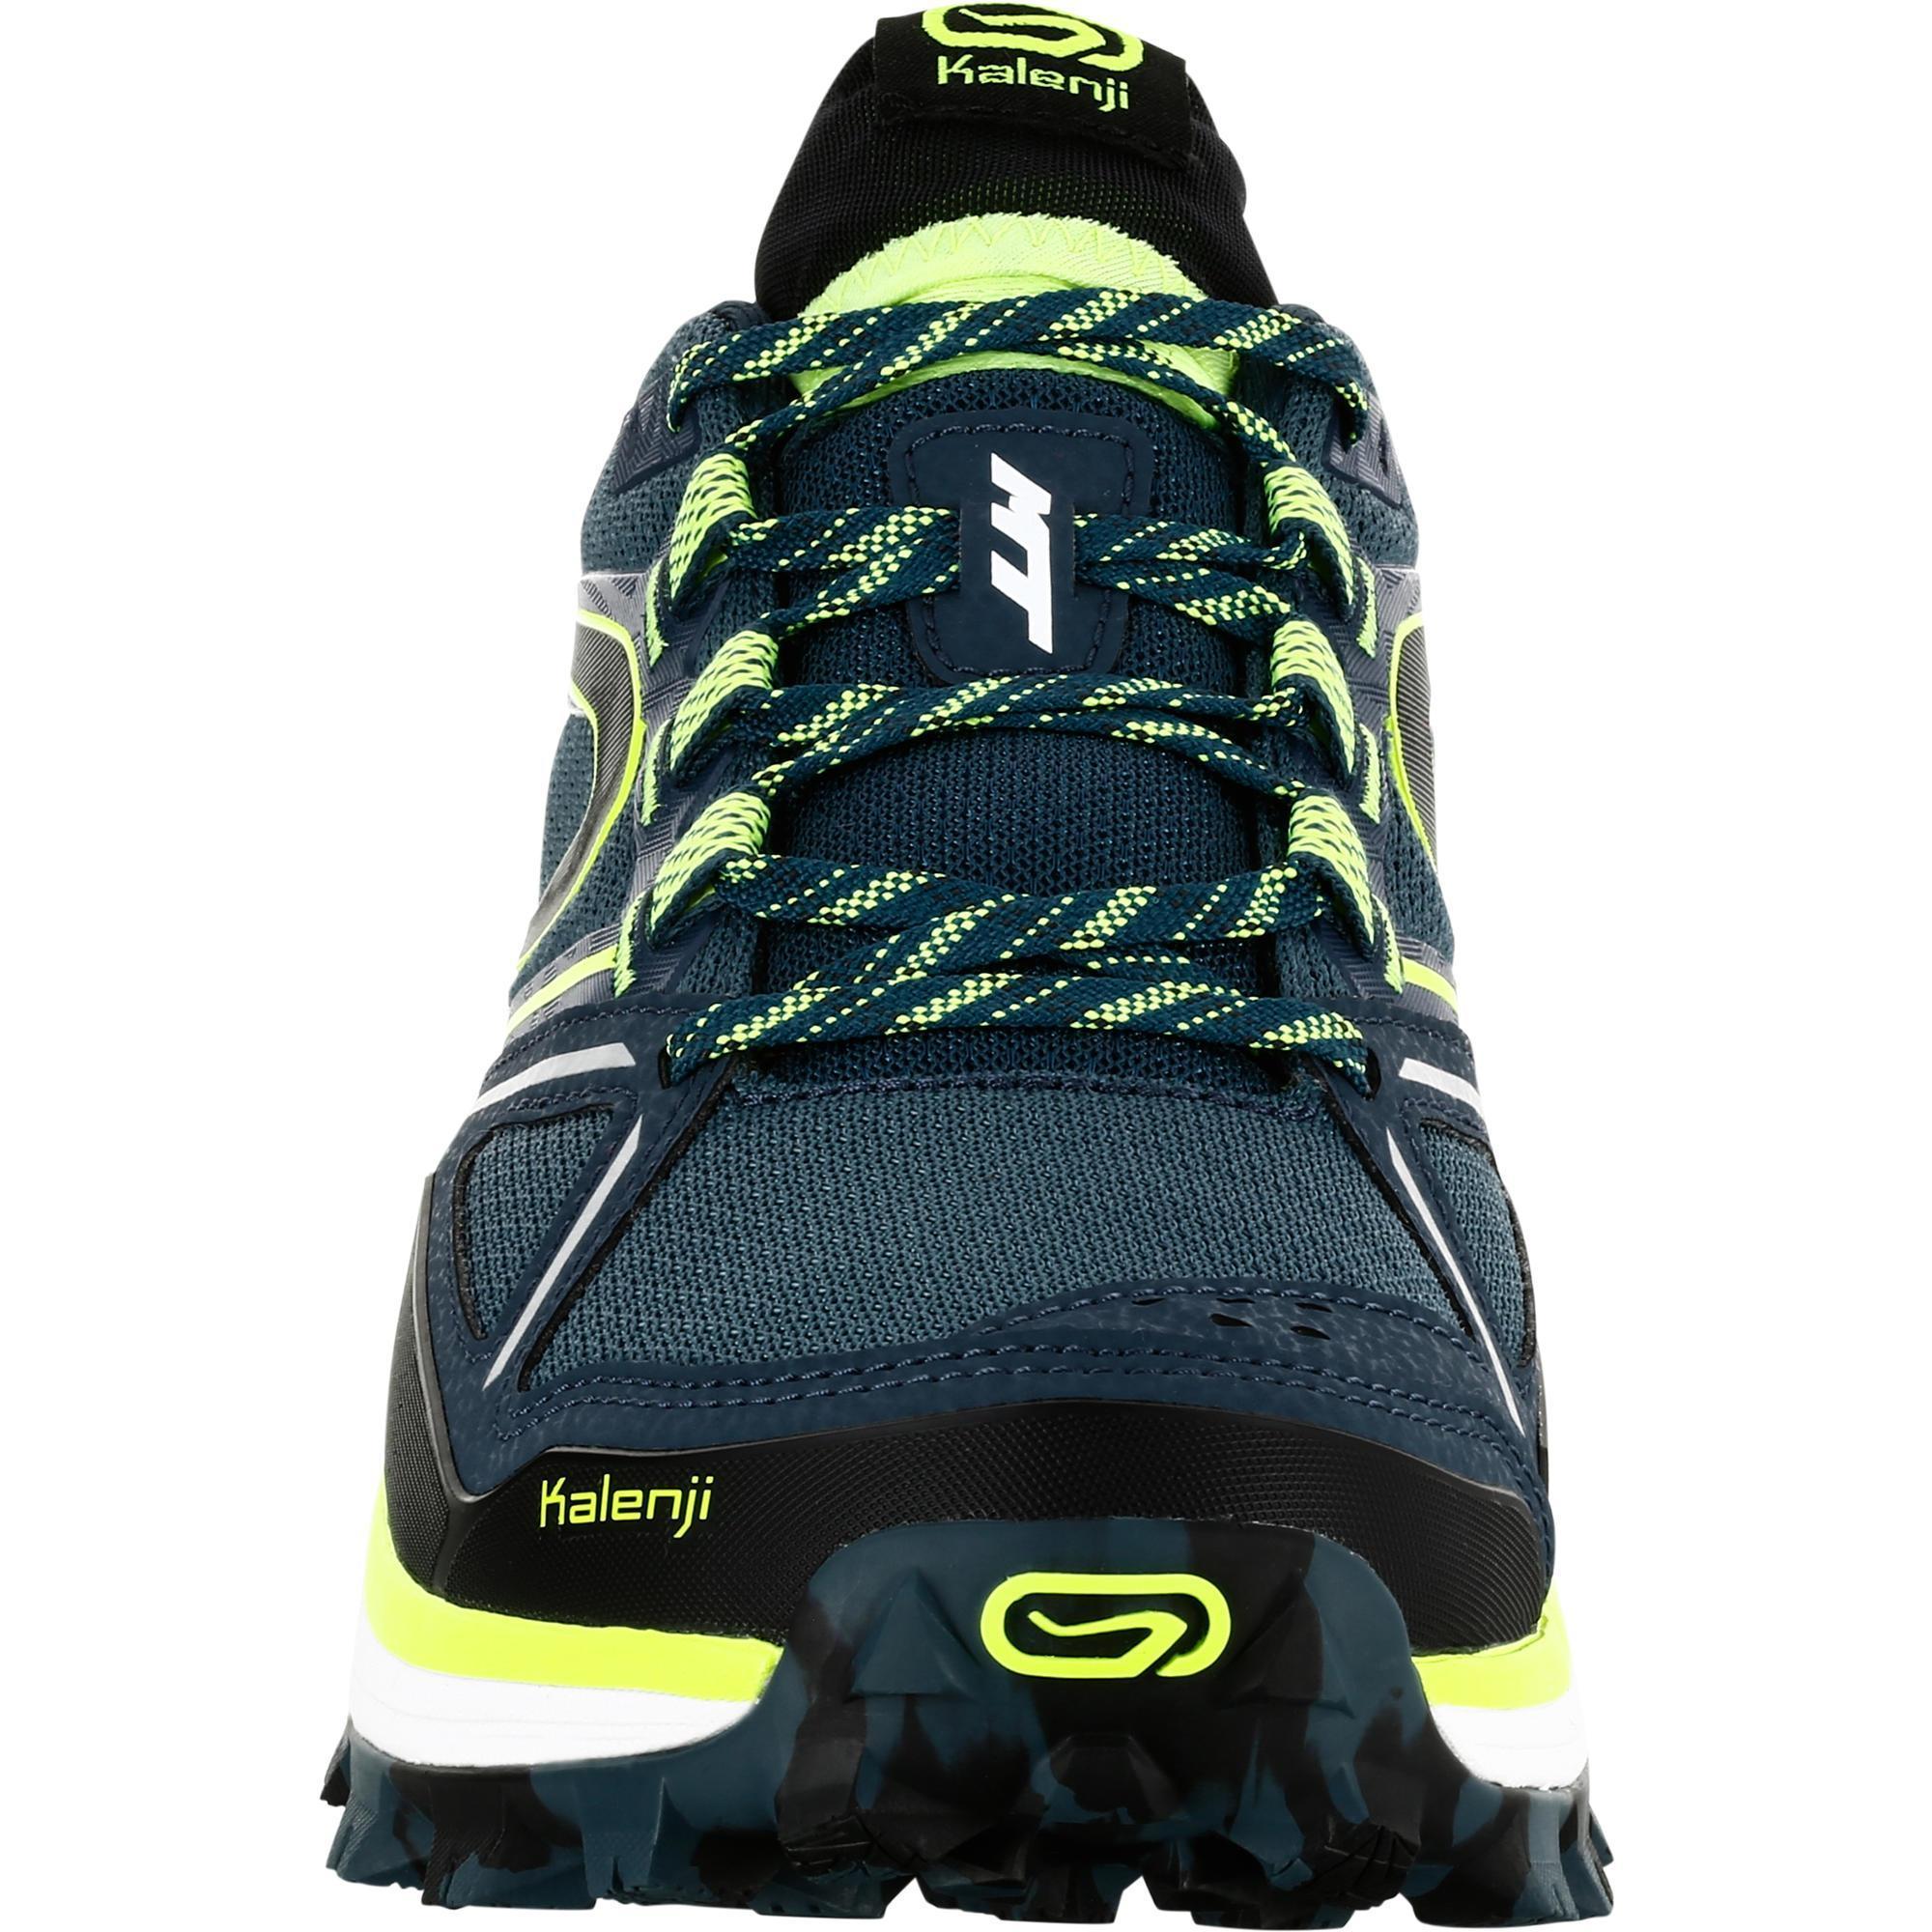 detailed look 013d3 3f64c Mt Chaussures Decathlon Homme Trail Kiprun Running Kalenji w68qApH